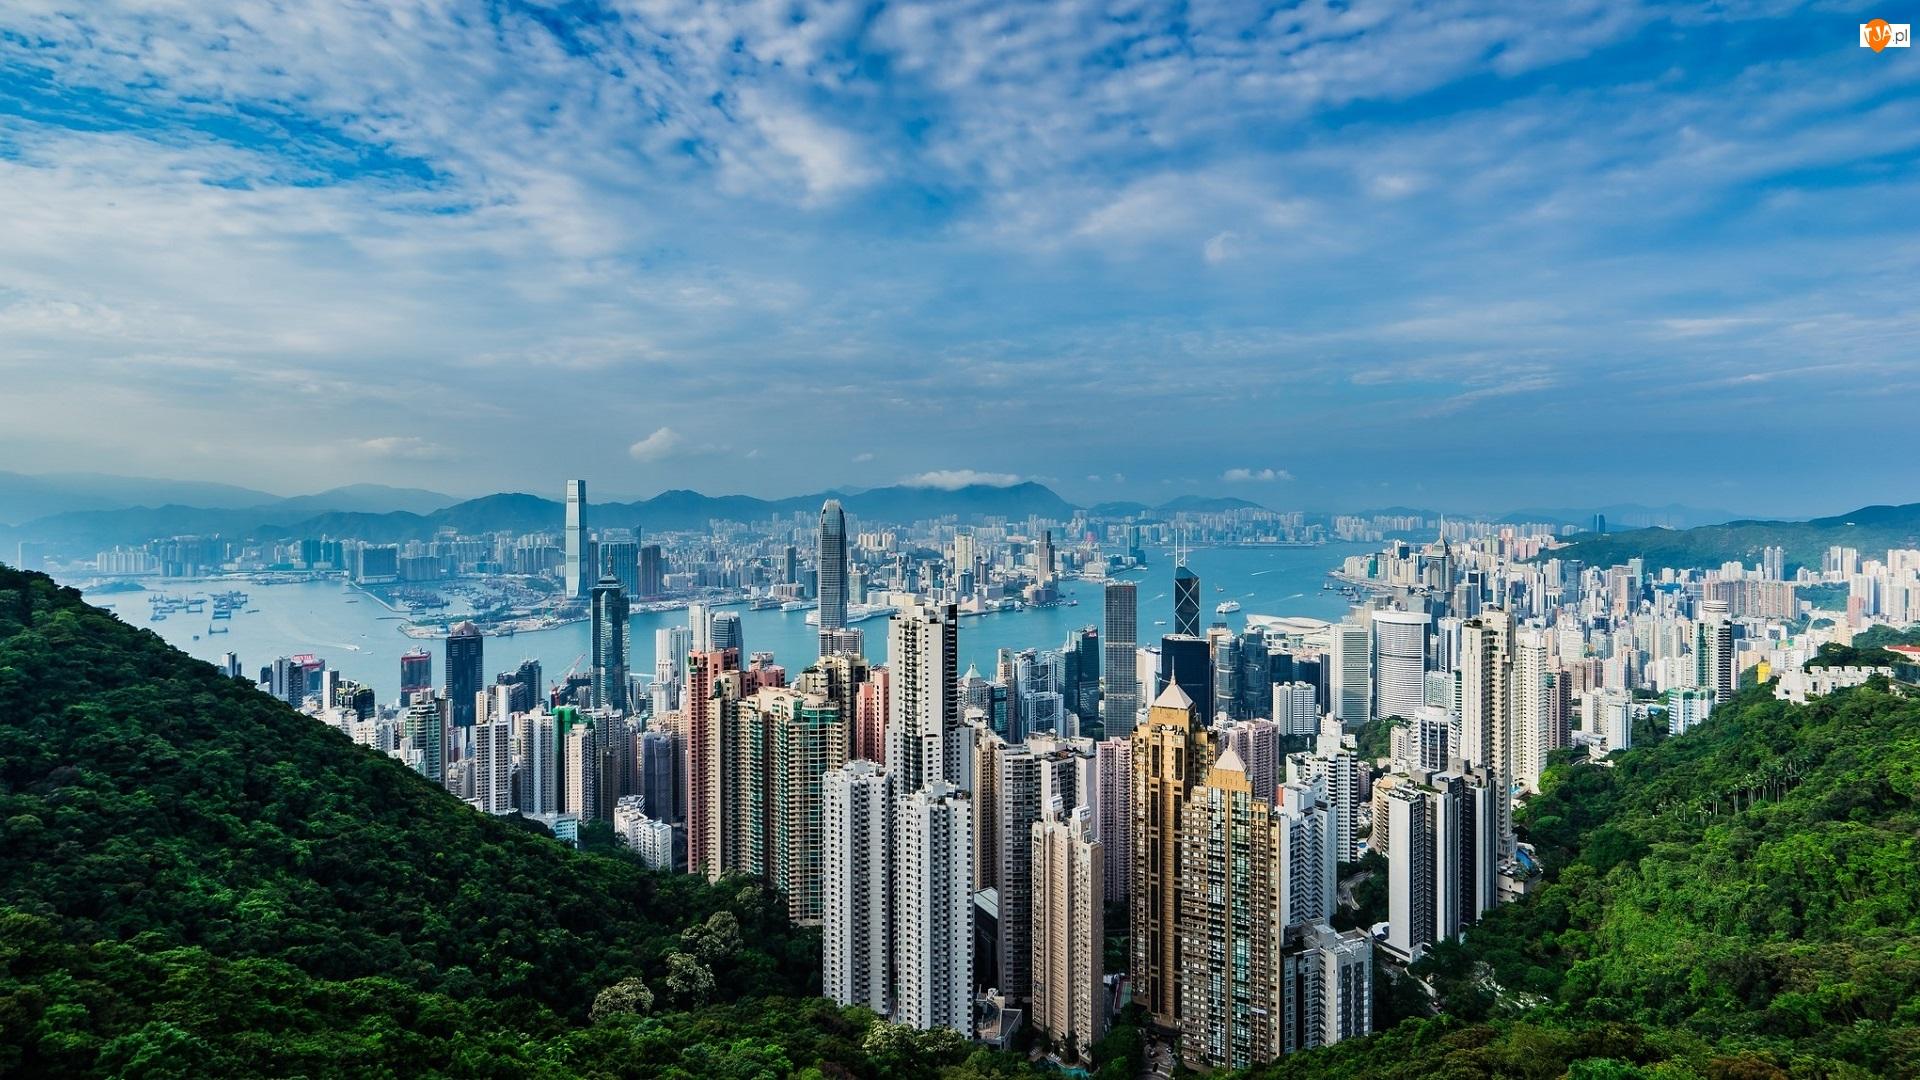 Drapacze chmur, Chiny, Hongkong, Wzgórze Wiktorii